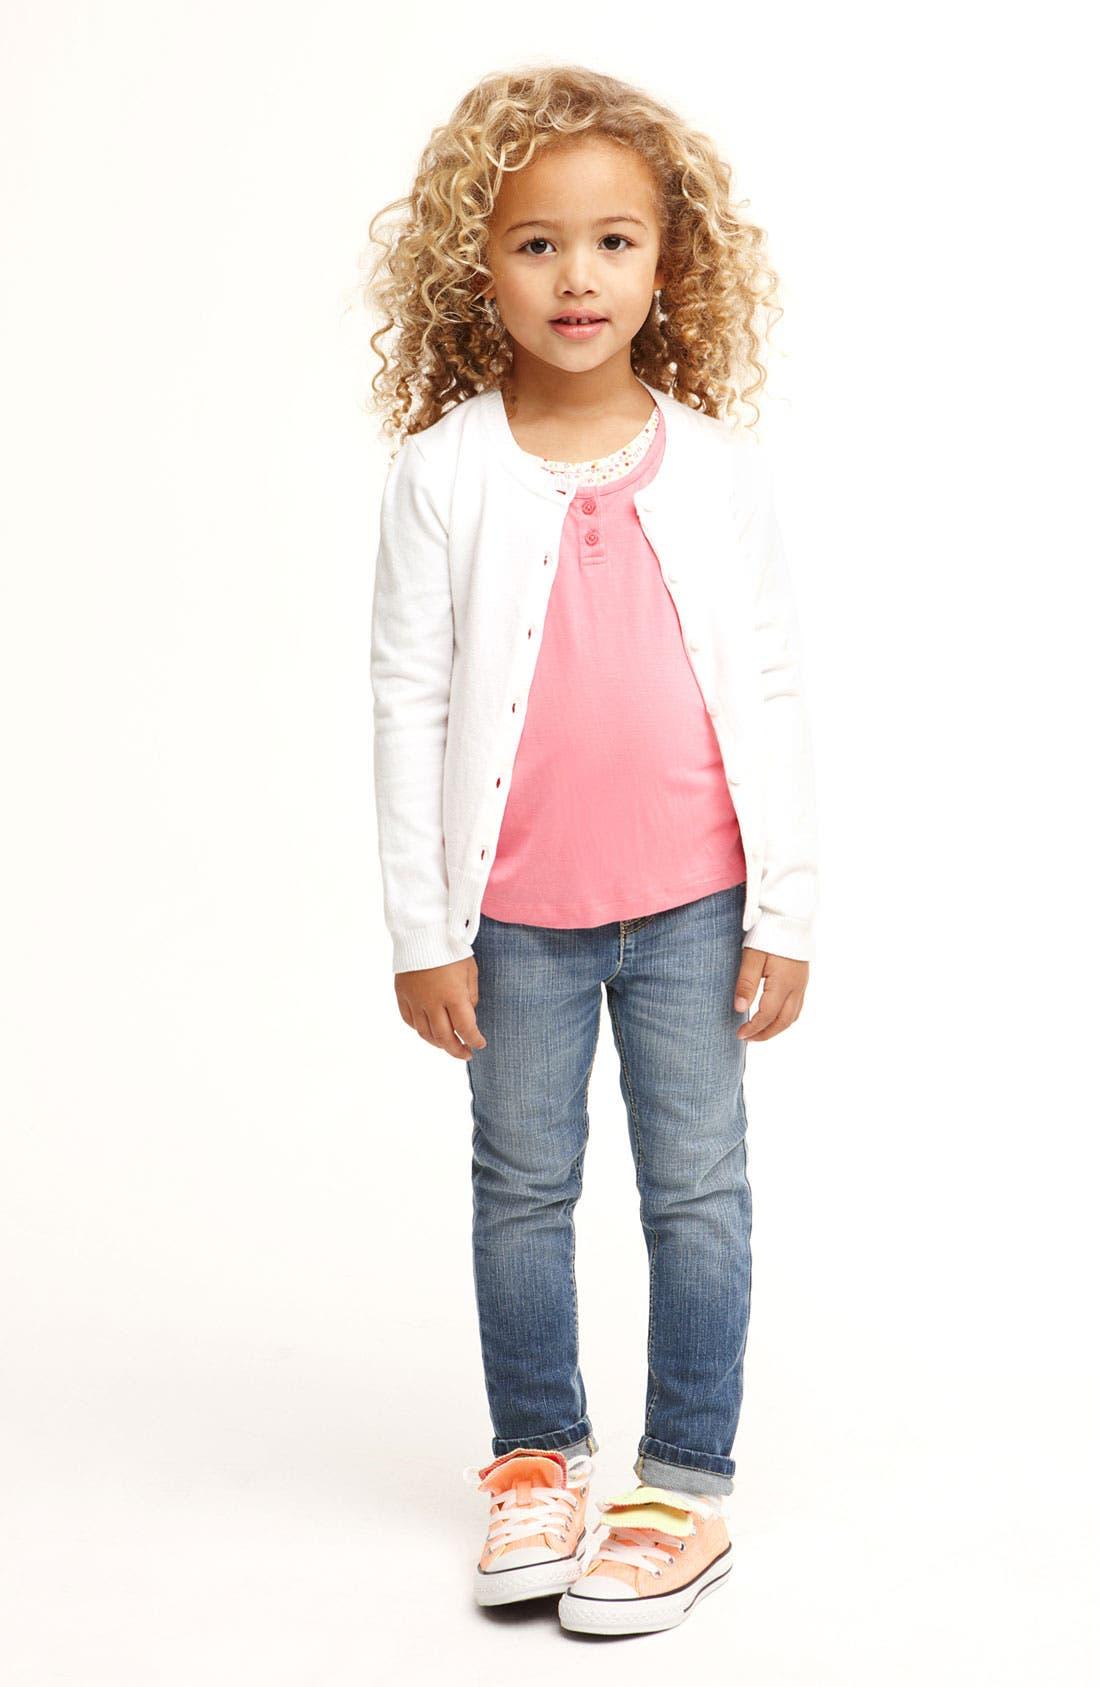 Alternate Image 1 Selected - Tucker + Tate Tank Top, Cardigan & Skinny Jeans & Converse Sneaker (Little Girls)